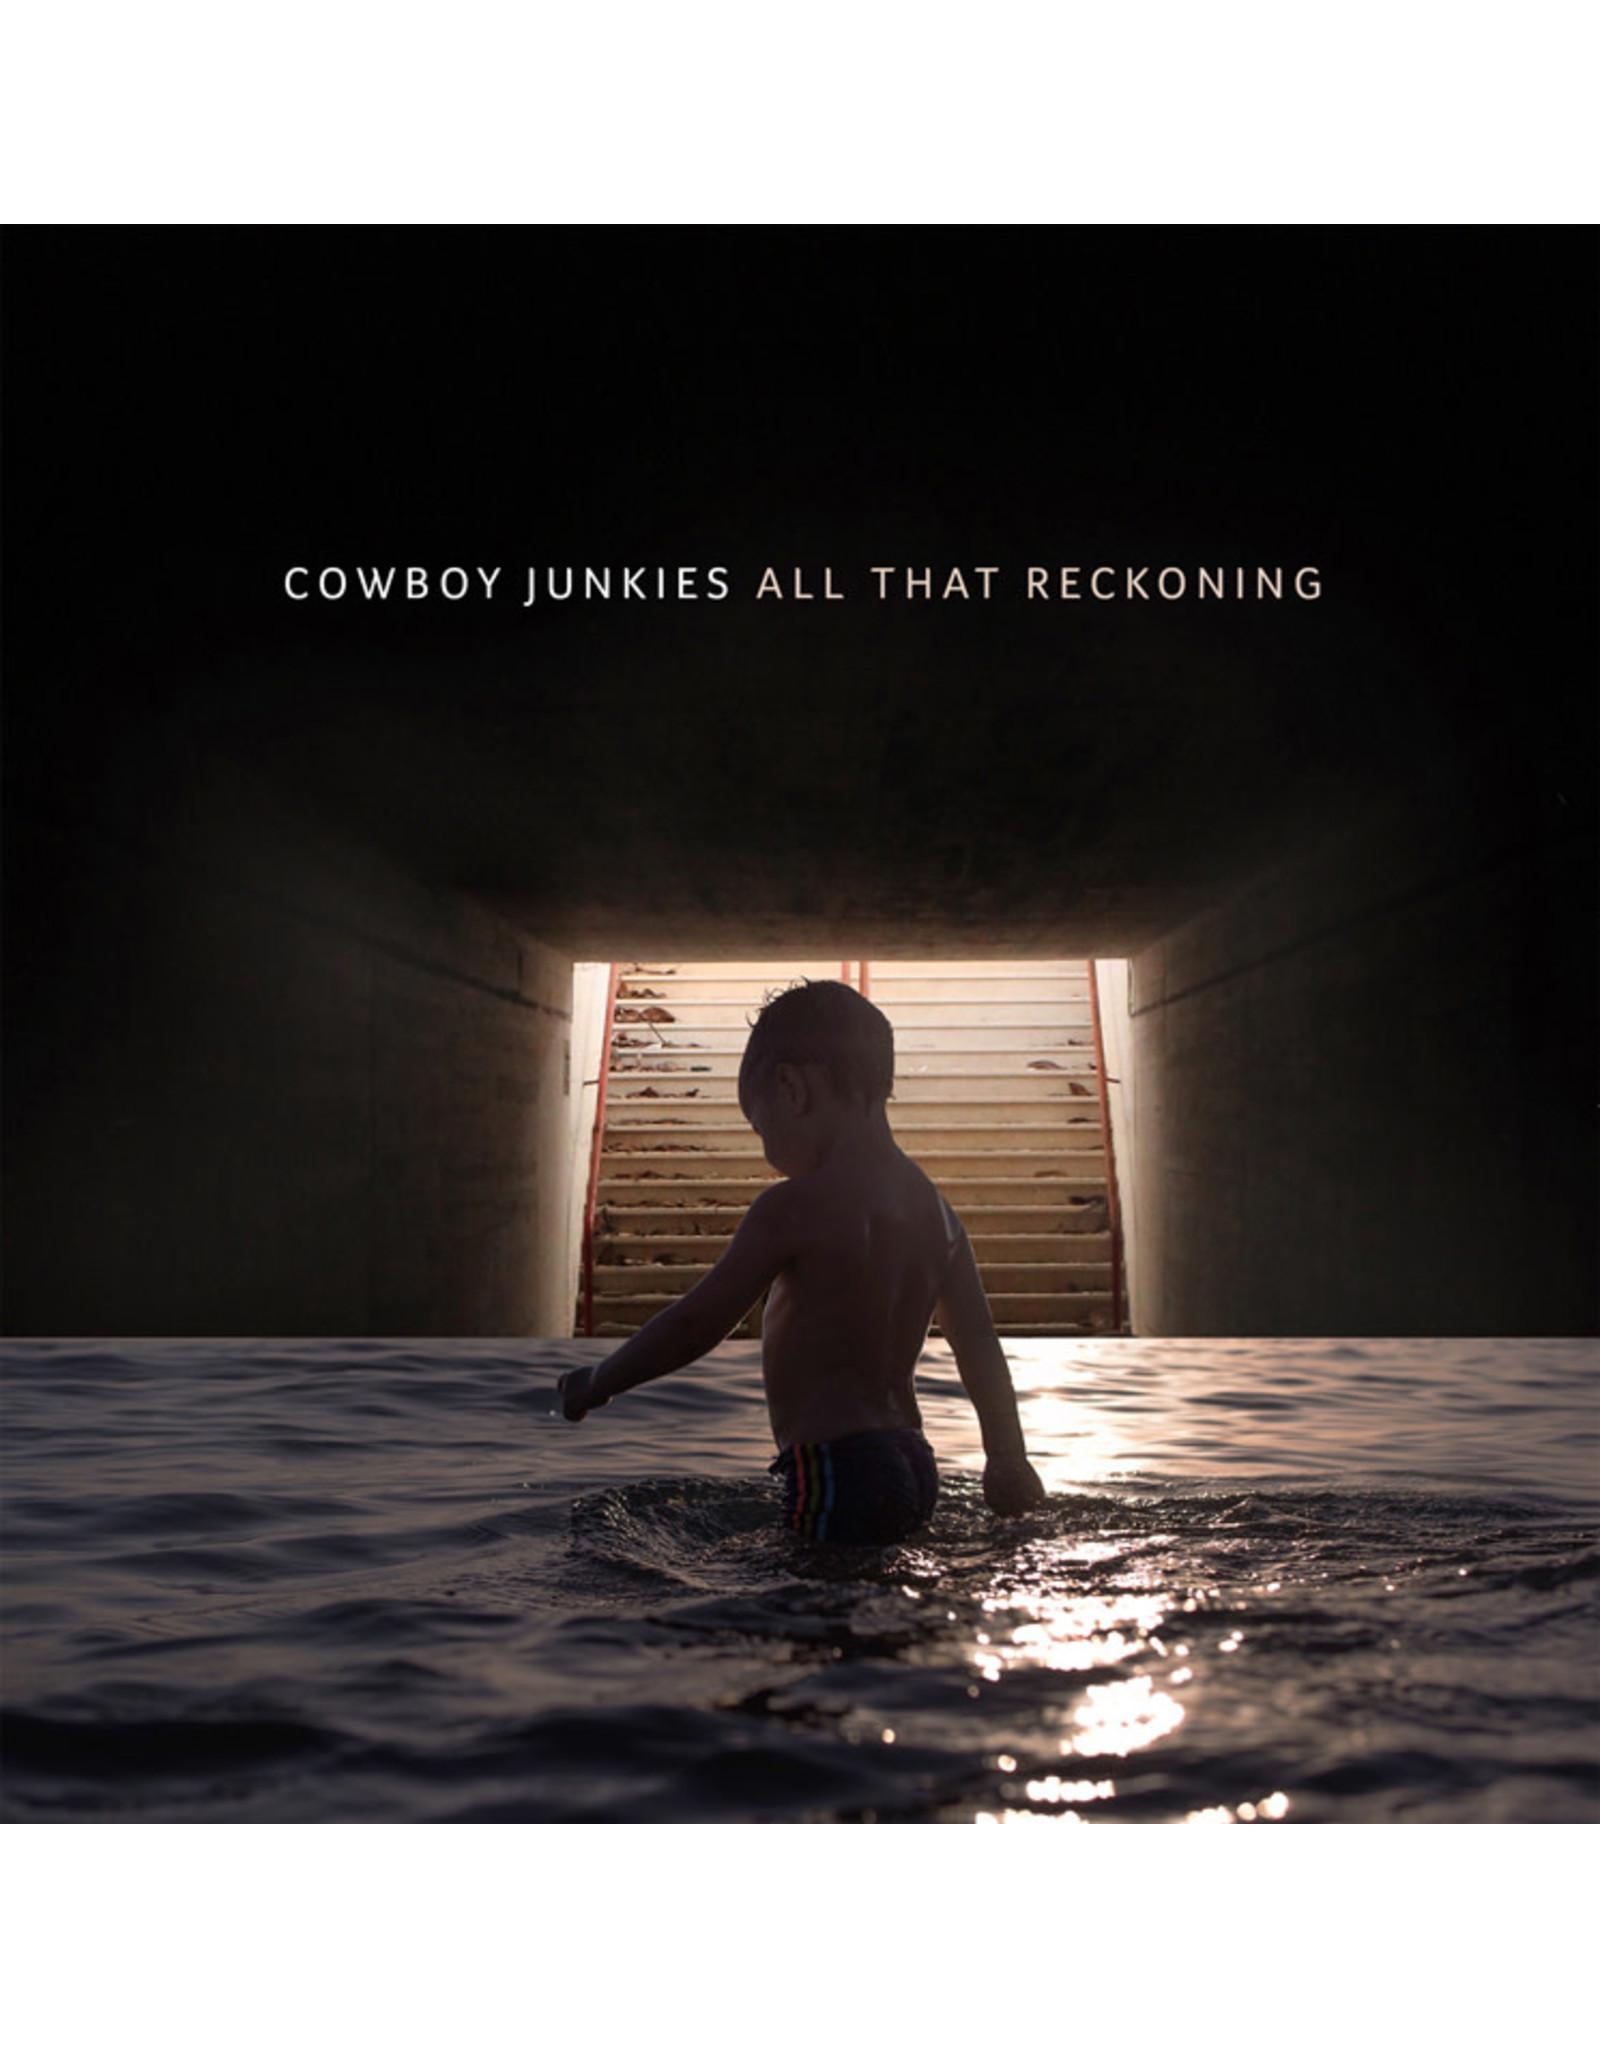 Cowboy Junkies - All That Reckoning